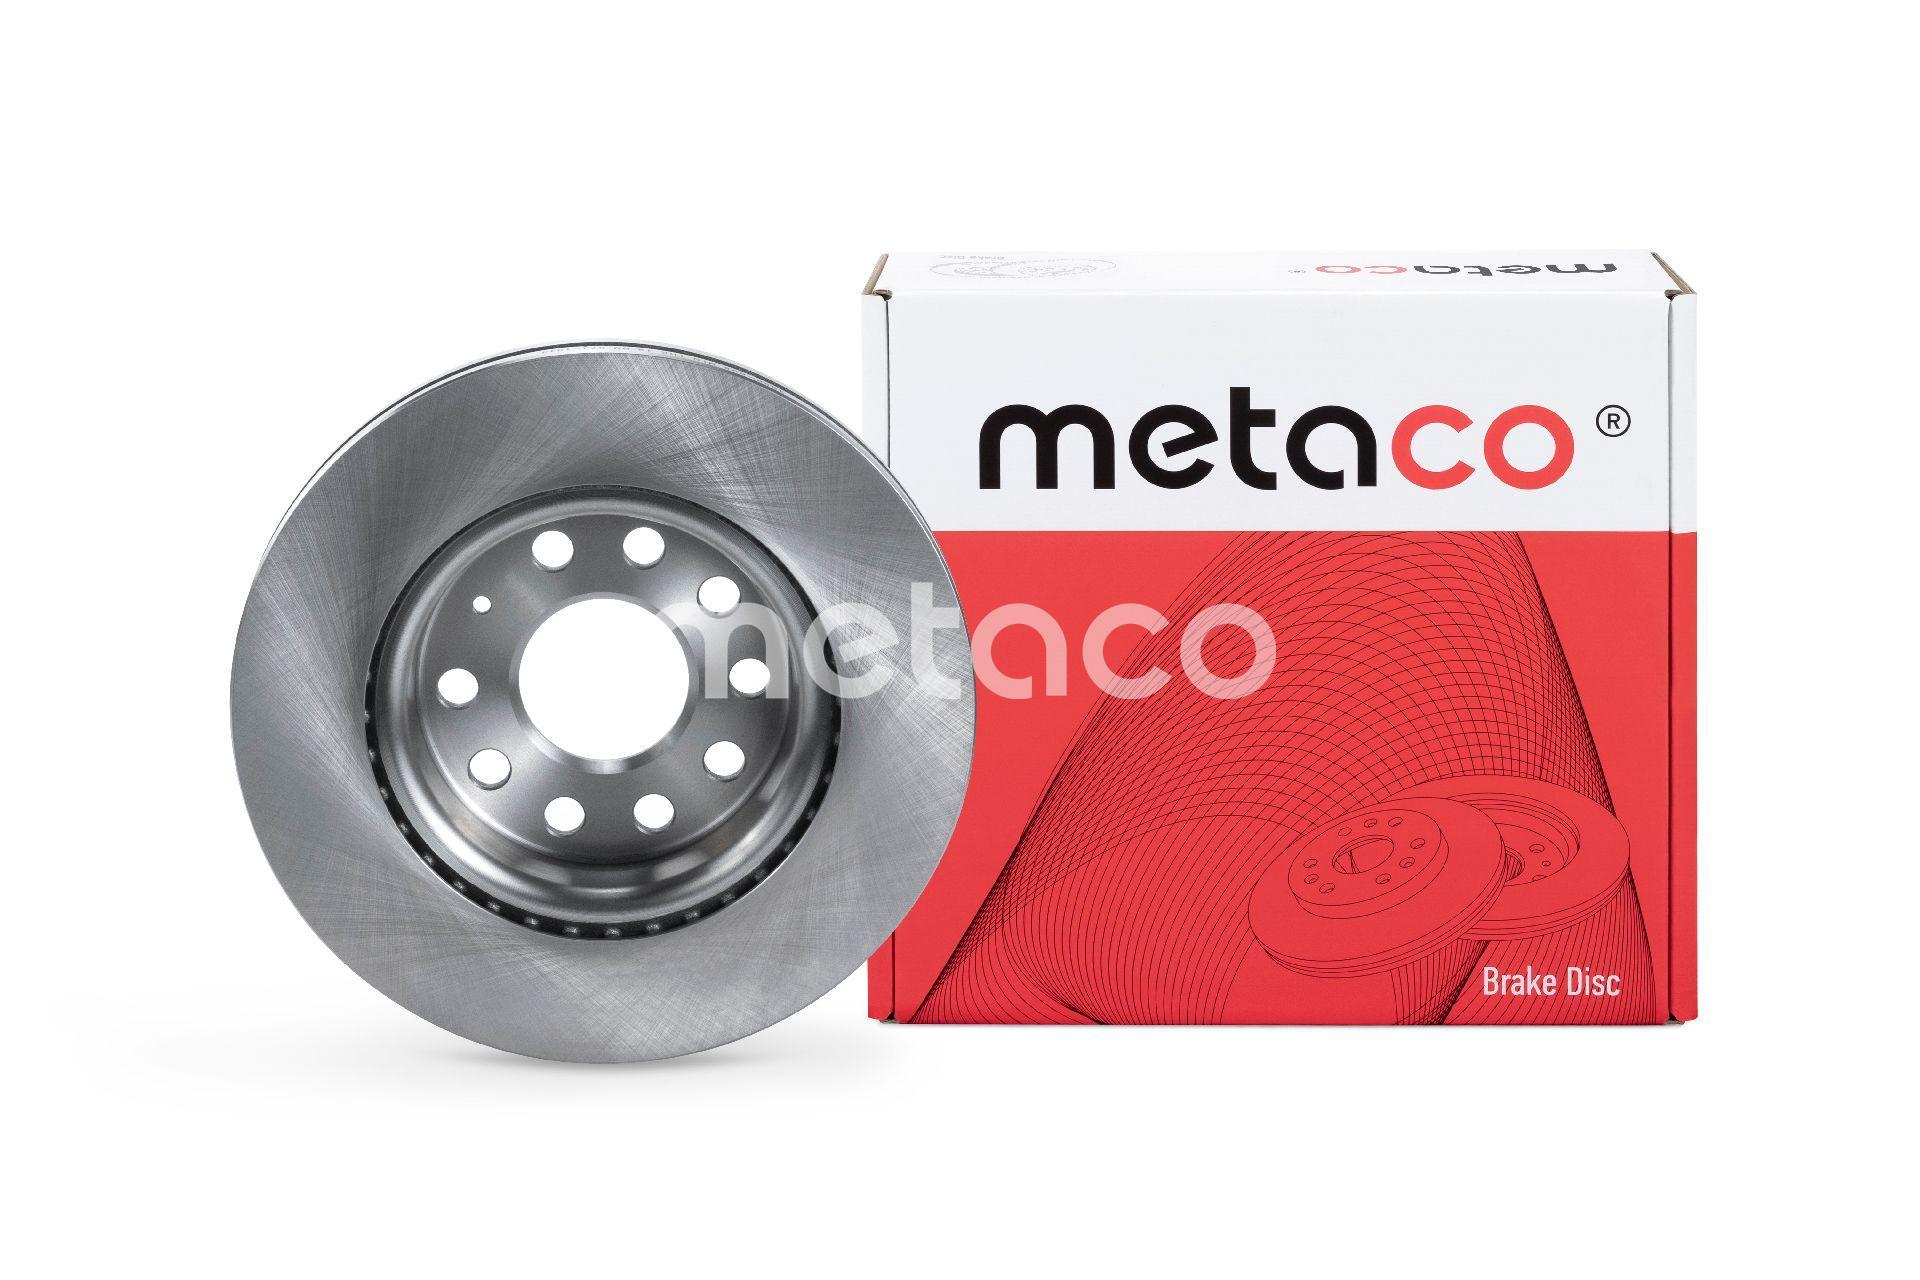 Metaco 3050-008 VAG 1K0615301AC, JZW615301A, 5C0615301, 1K0615301AQ, 1K0615301AK, 1K0615301S, 1K0615301AS